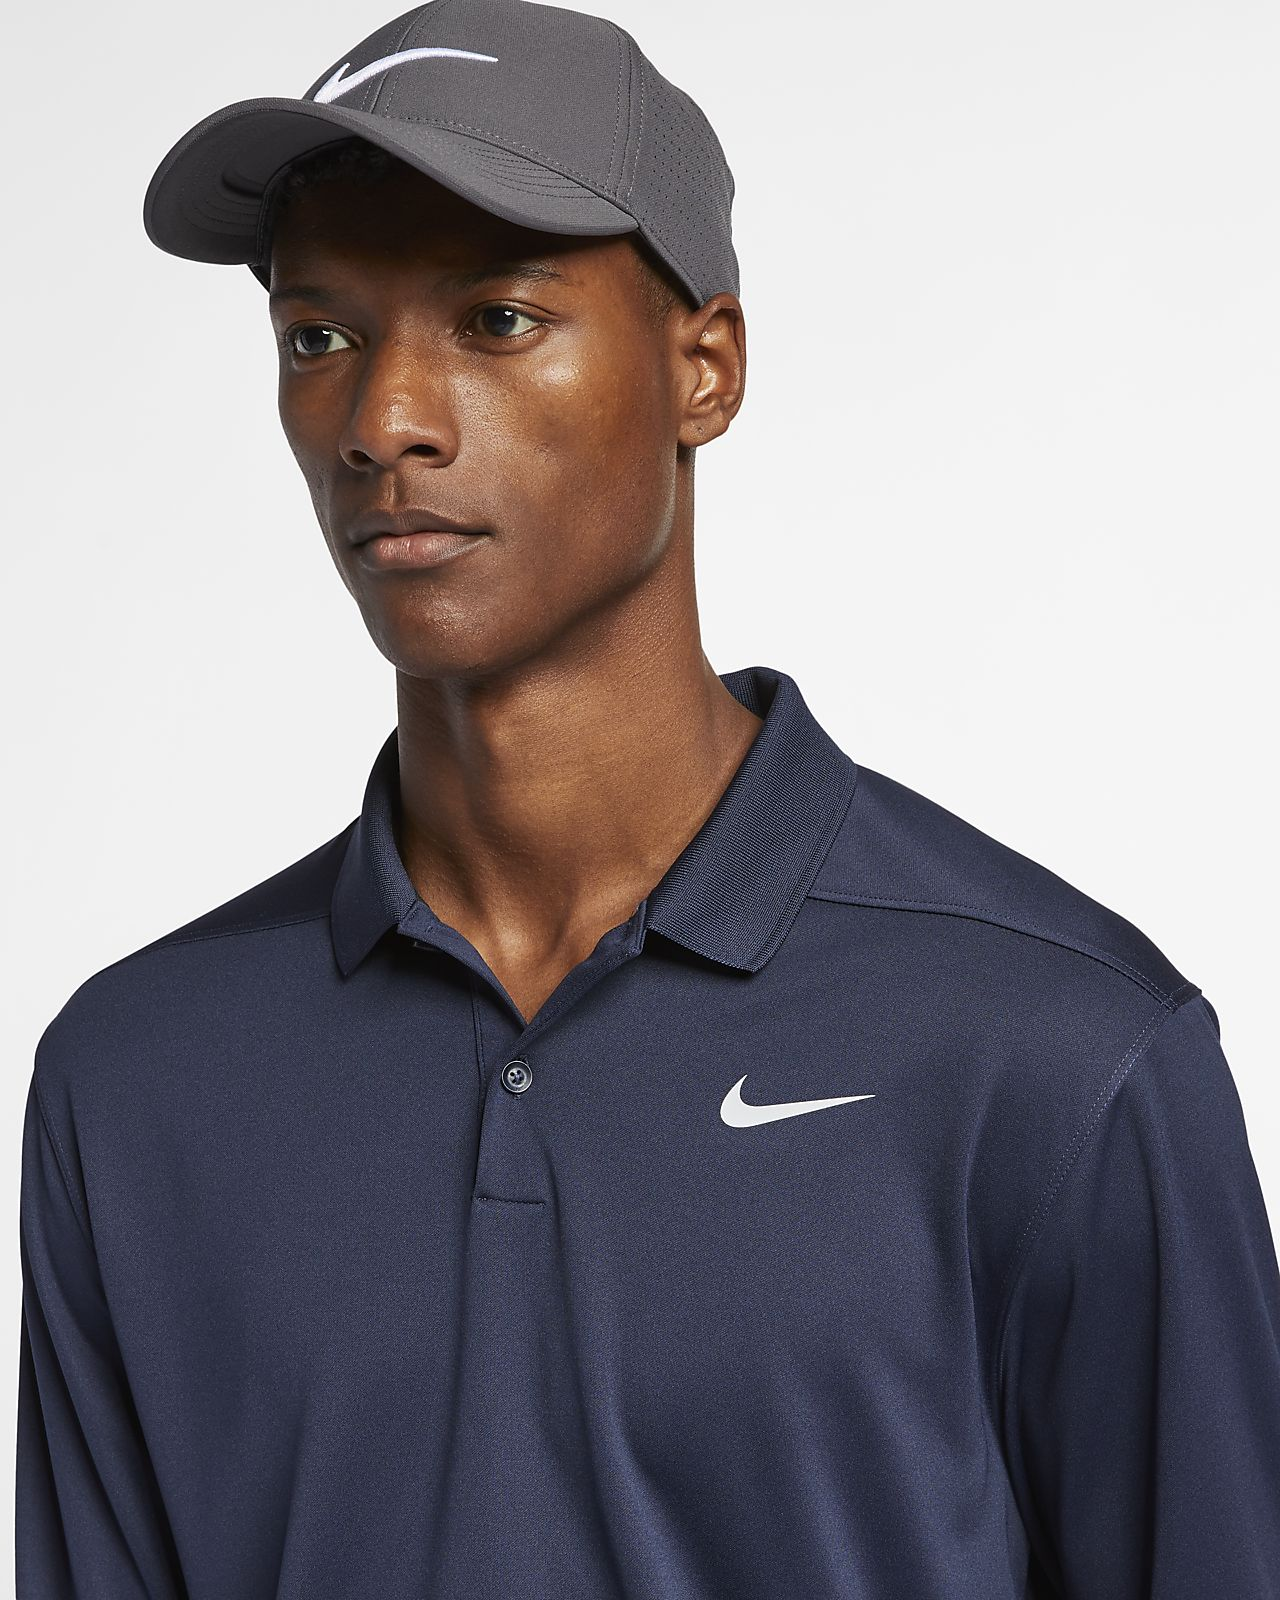 6b0ec8c78 Nike Dri-FIT Victory Men's Golf Polo. Nike.com